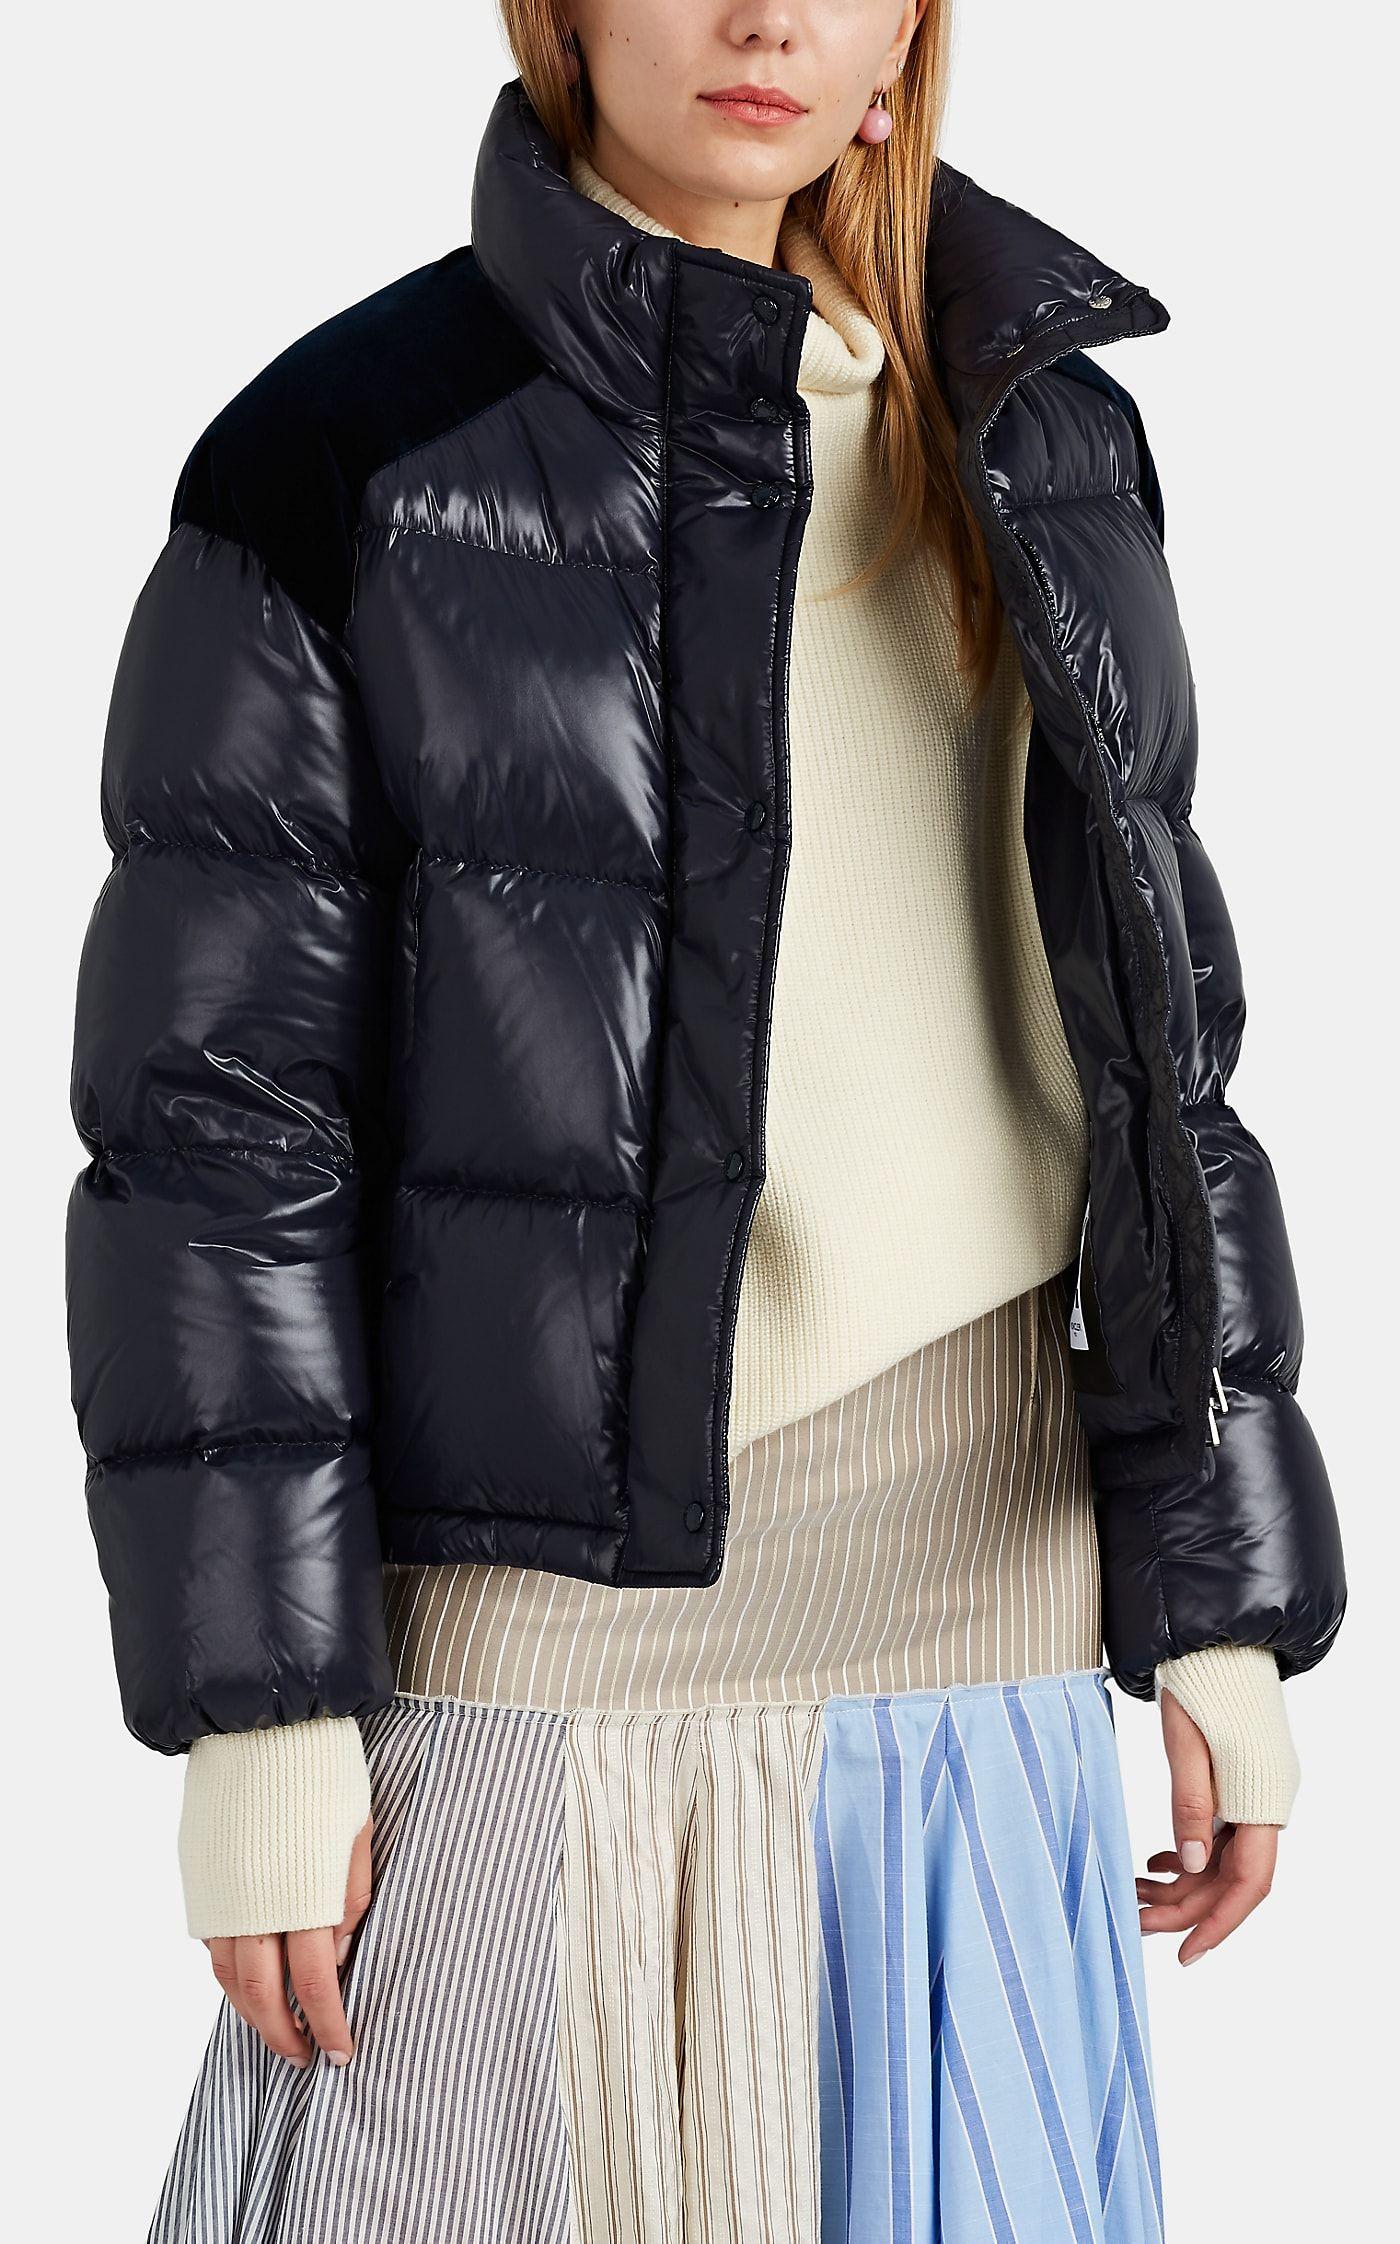 Frauen Jackets : Moncler Jacke,Moncler Jacken,Moncler